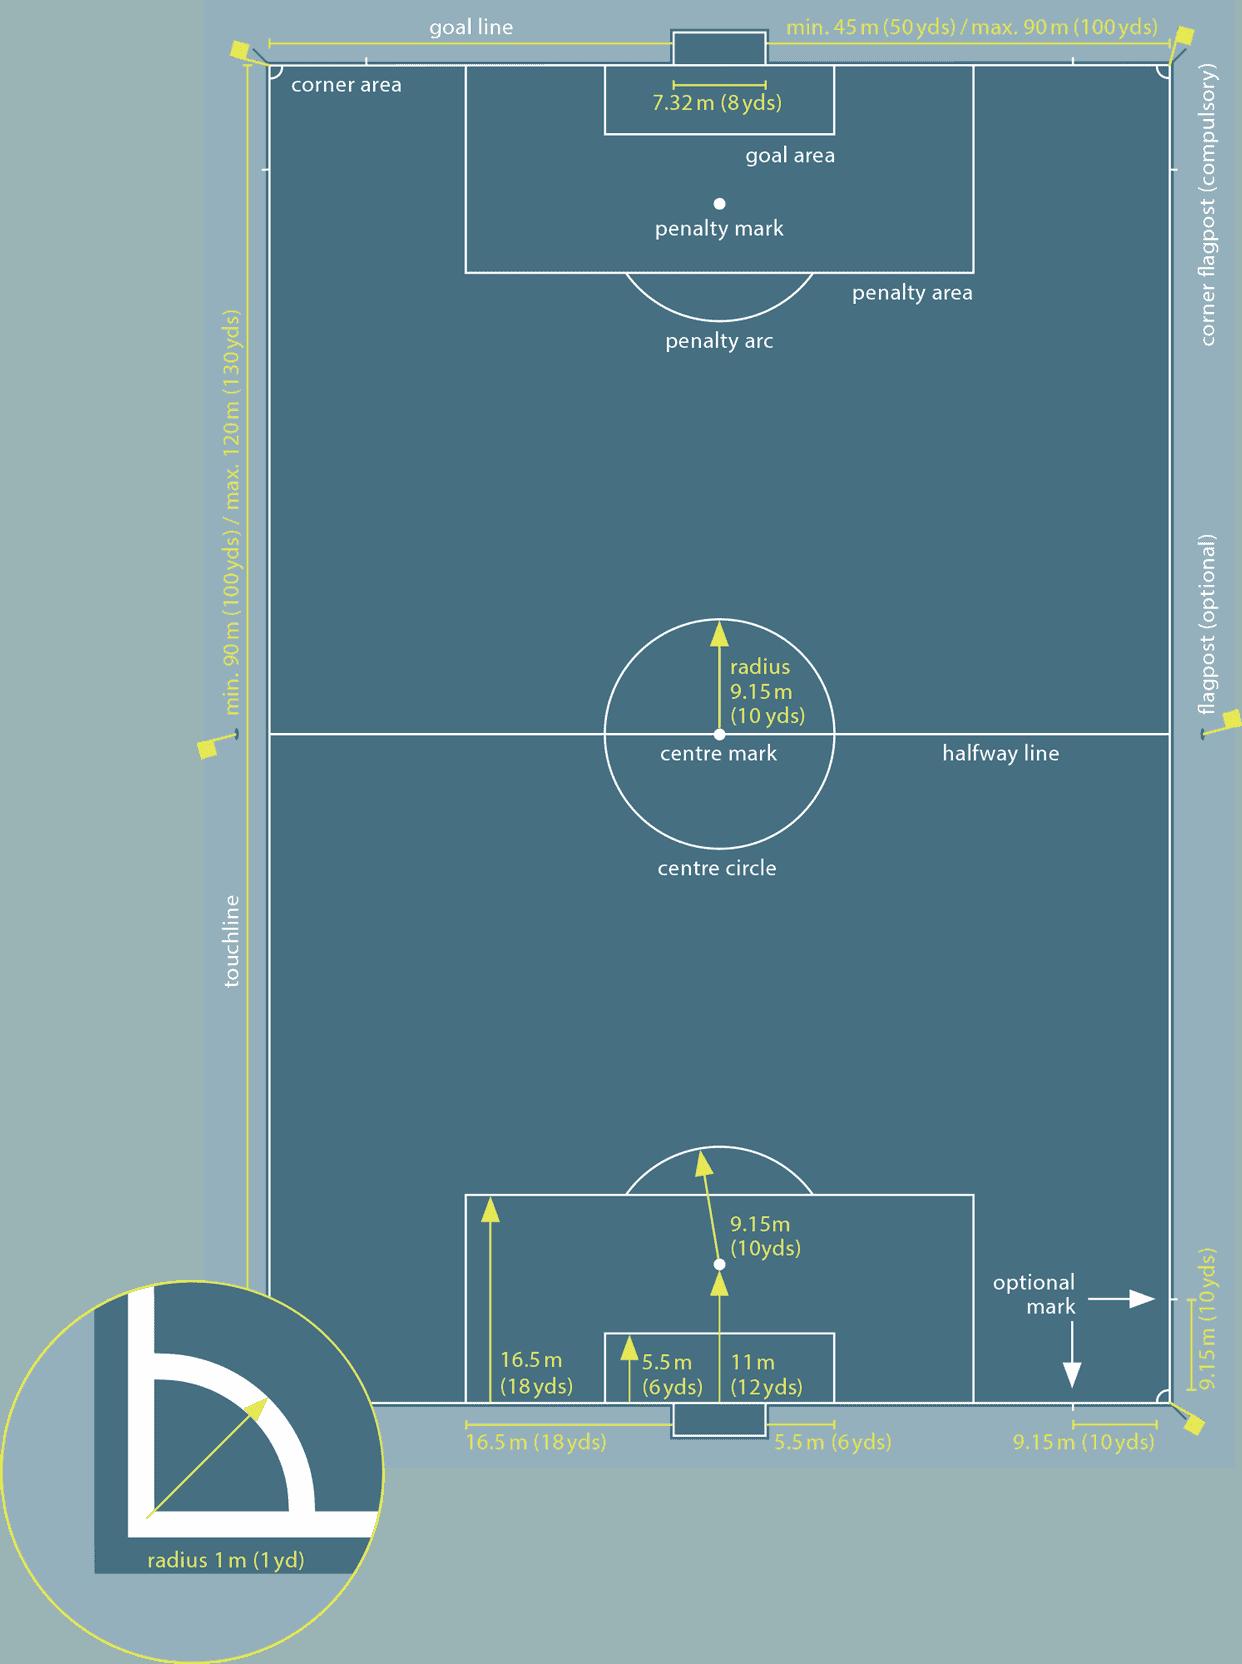 Soccer field Dimensions - International Match